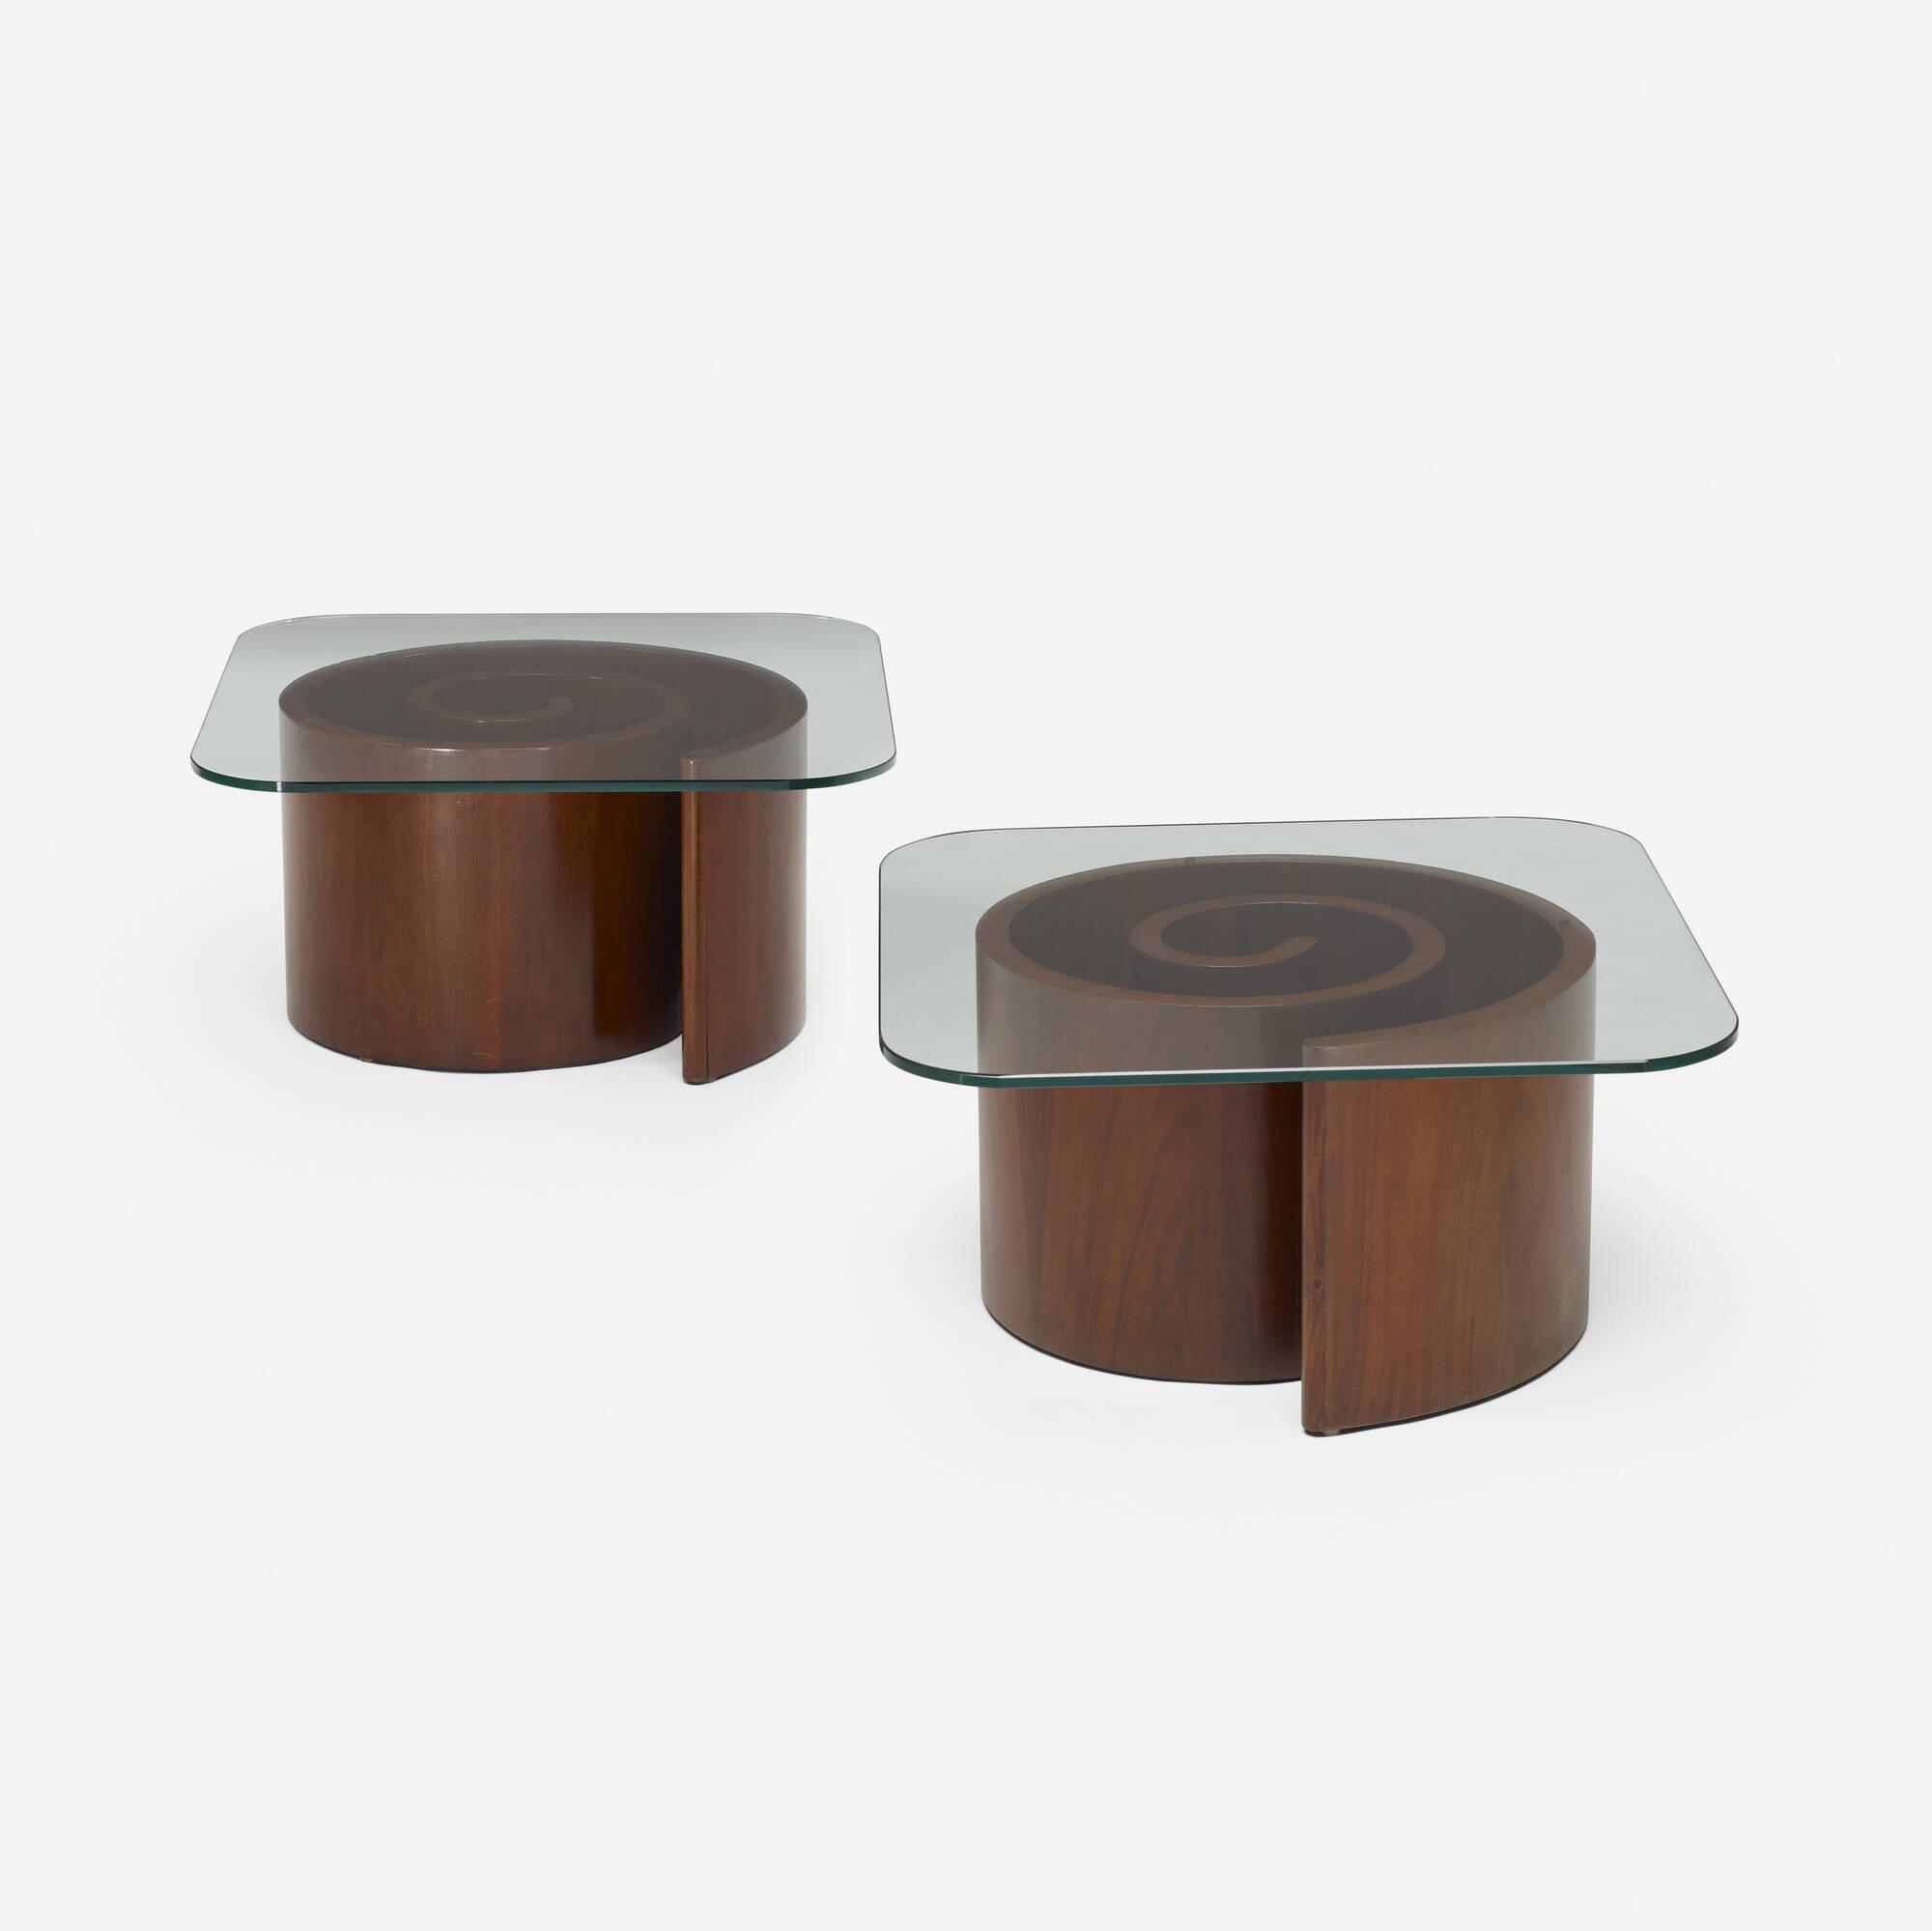 269: Vladimir Kagan / Coffee Tables, Pair (1 Of 2)